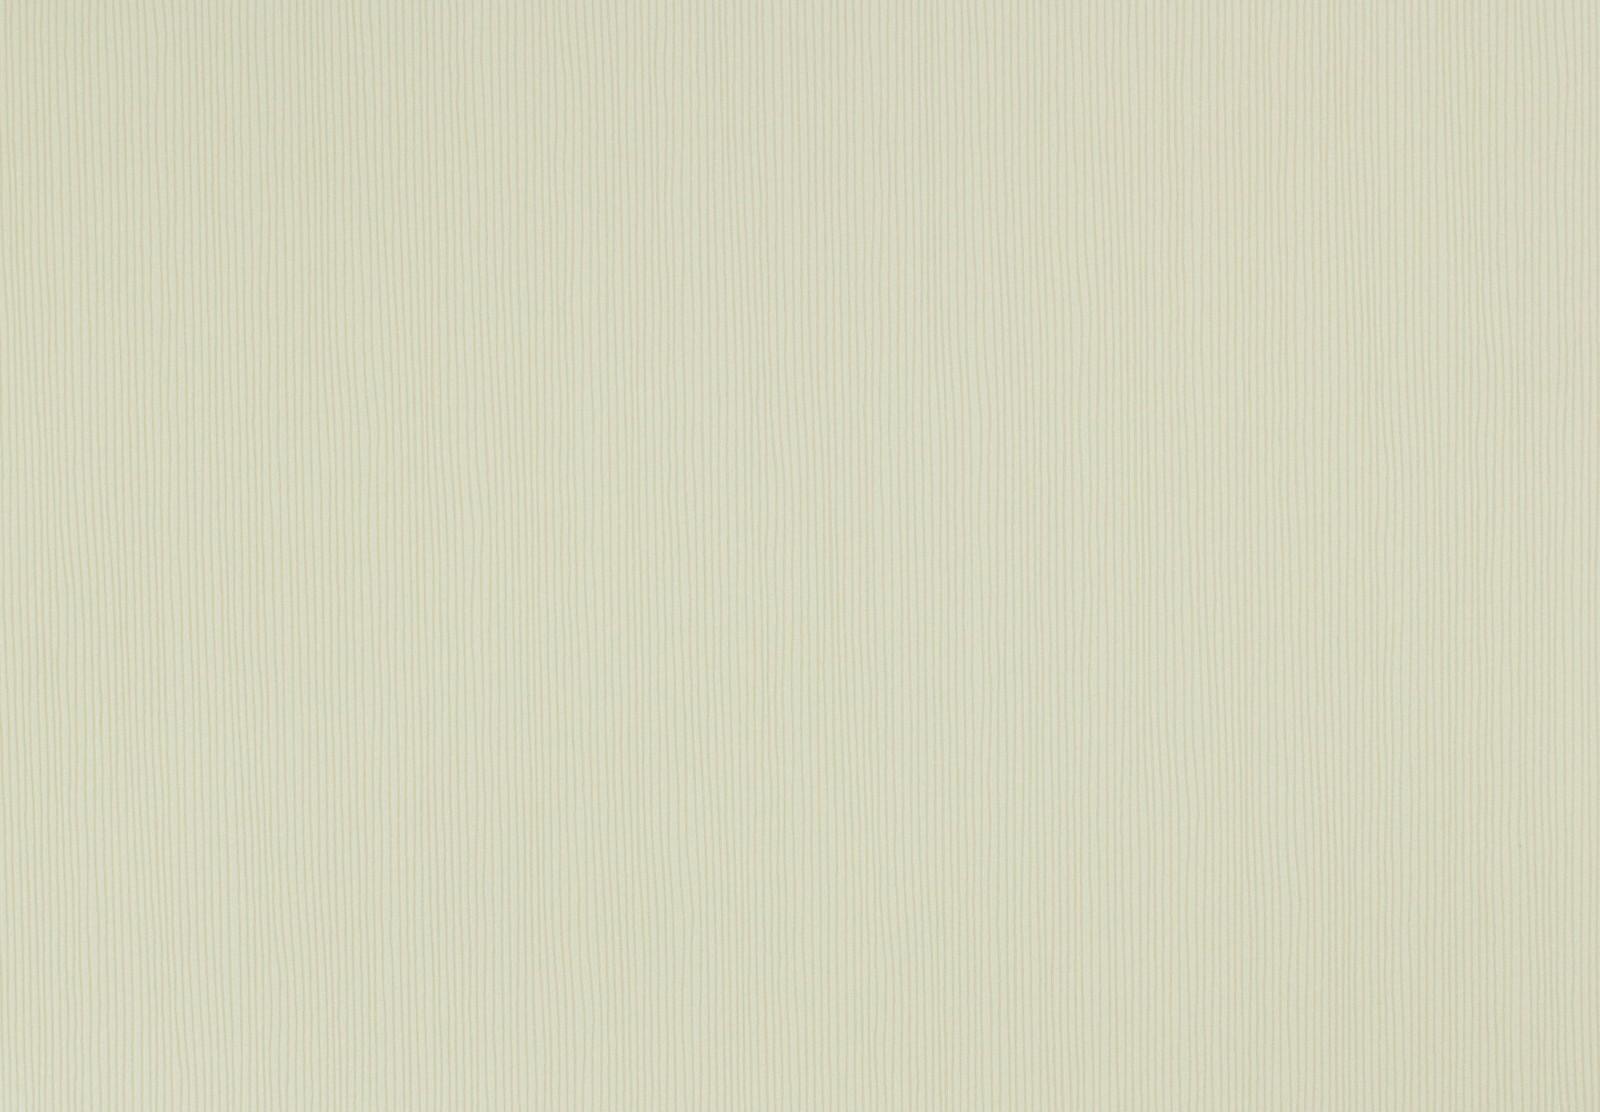 wallpaper esprit home 9 non woven wallpaper 93993 6 939936. Black Bedroom Furniture Sets. Home Design Ideas